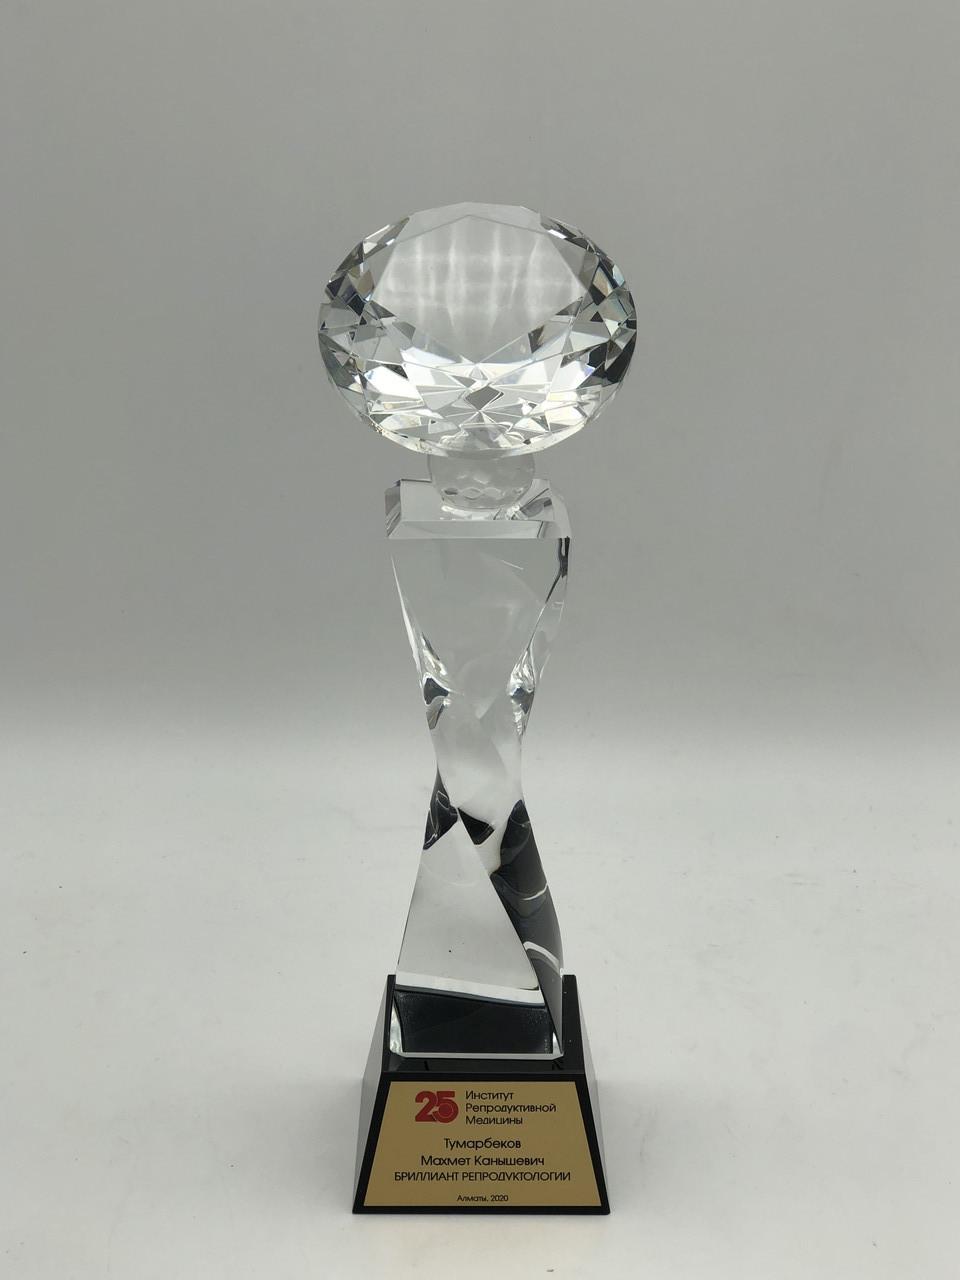 Статуэтка из хрусталя в форме бриллианта